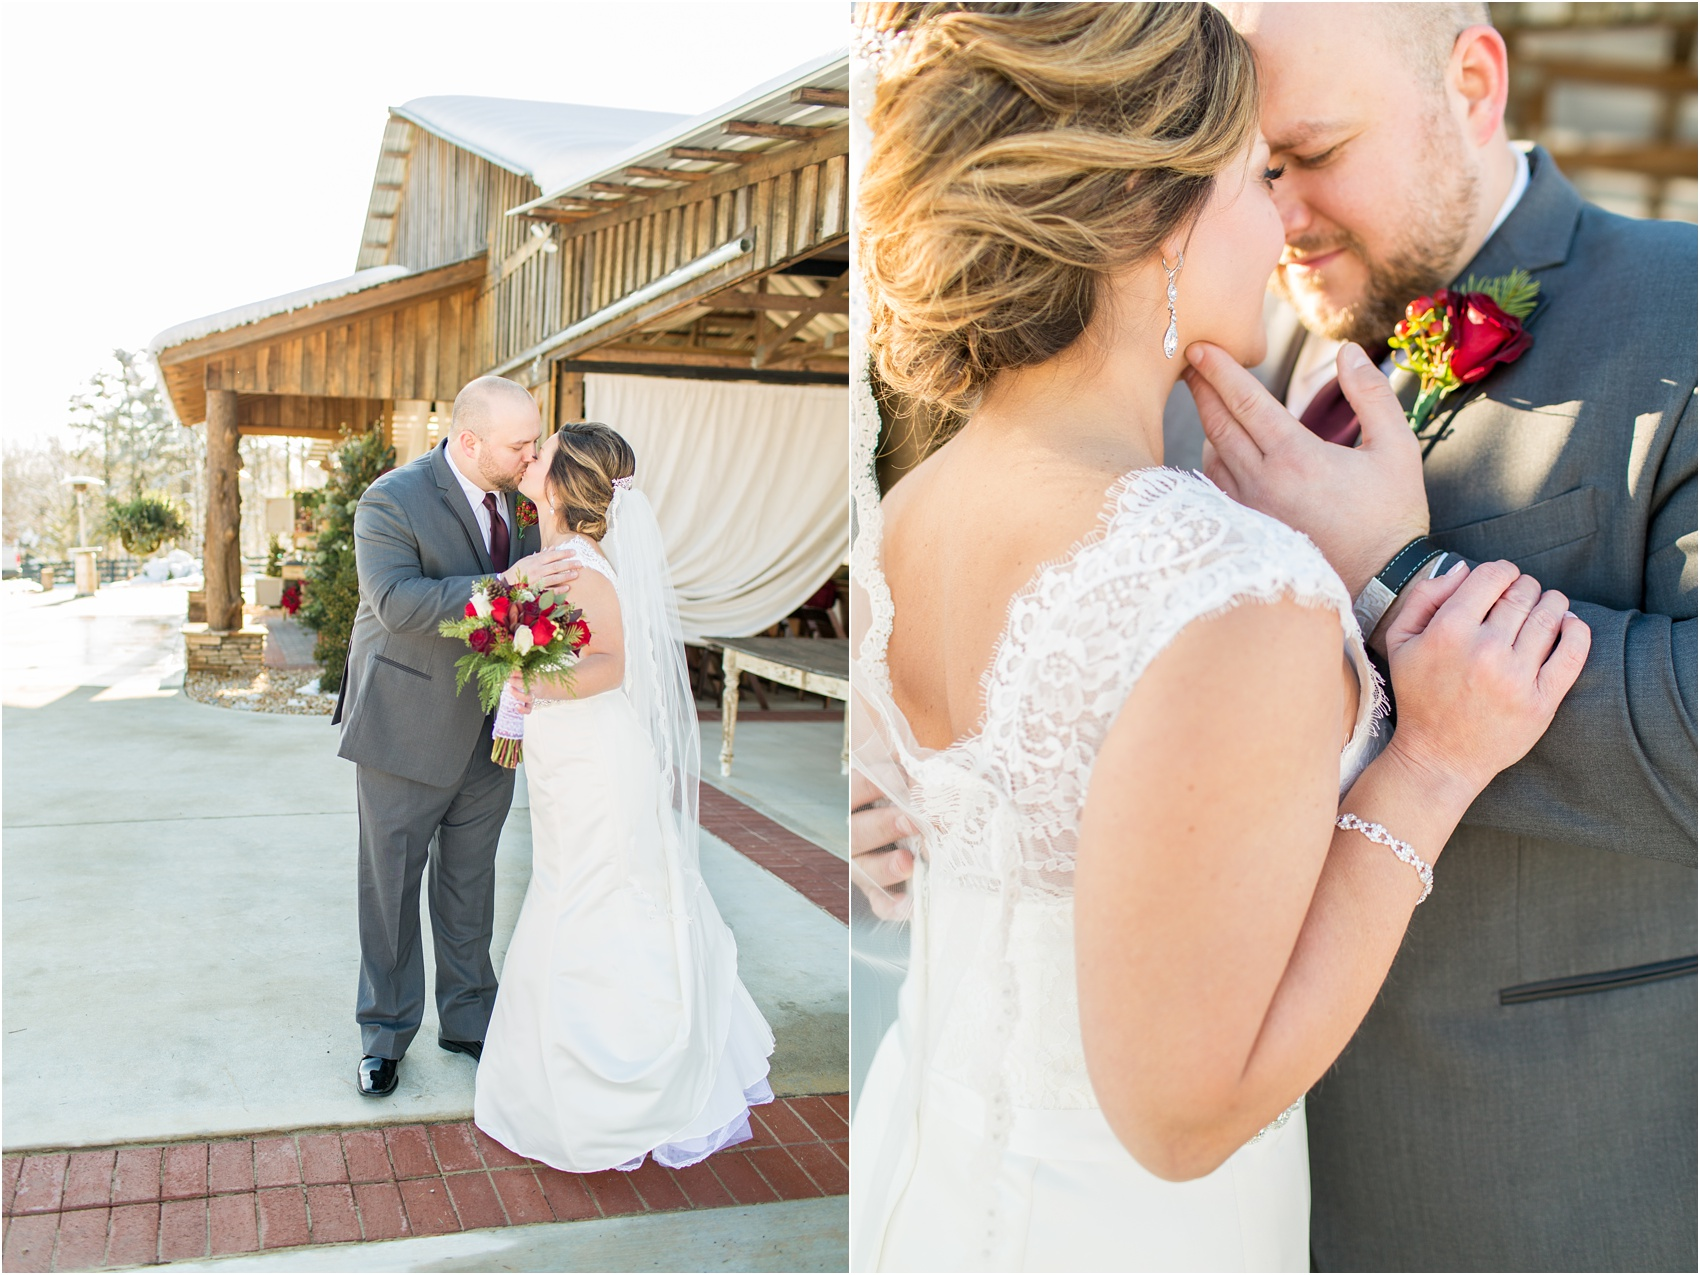 Savannah Eve Photography- Page Wedding Blog-42.jpg